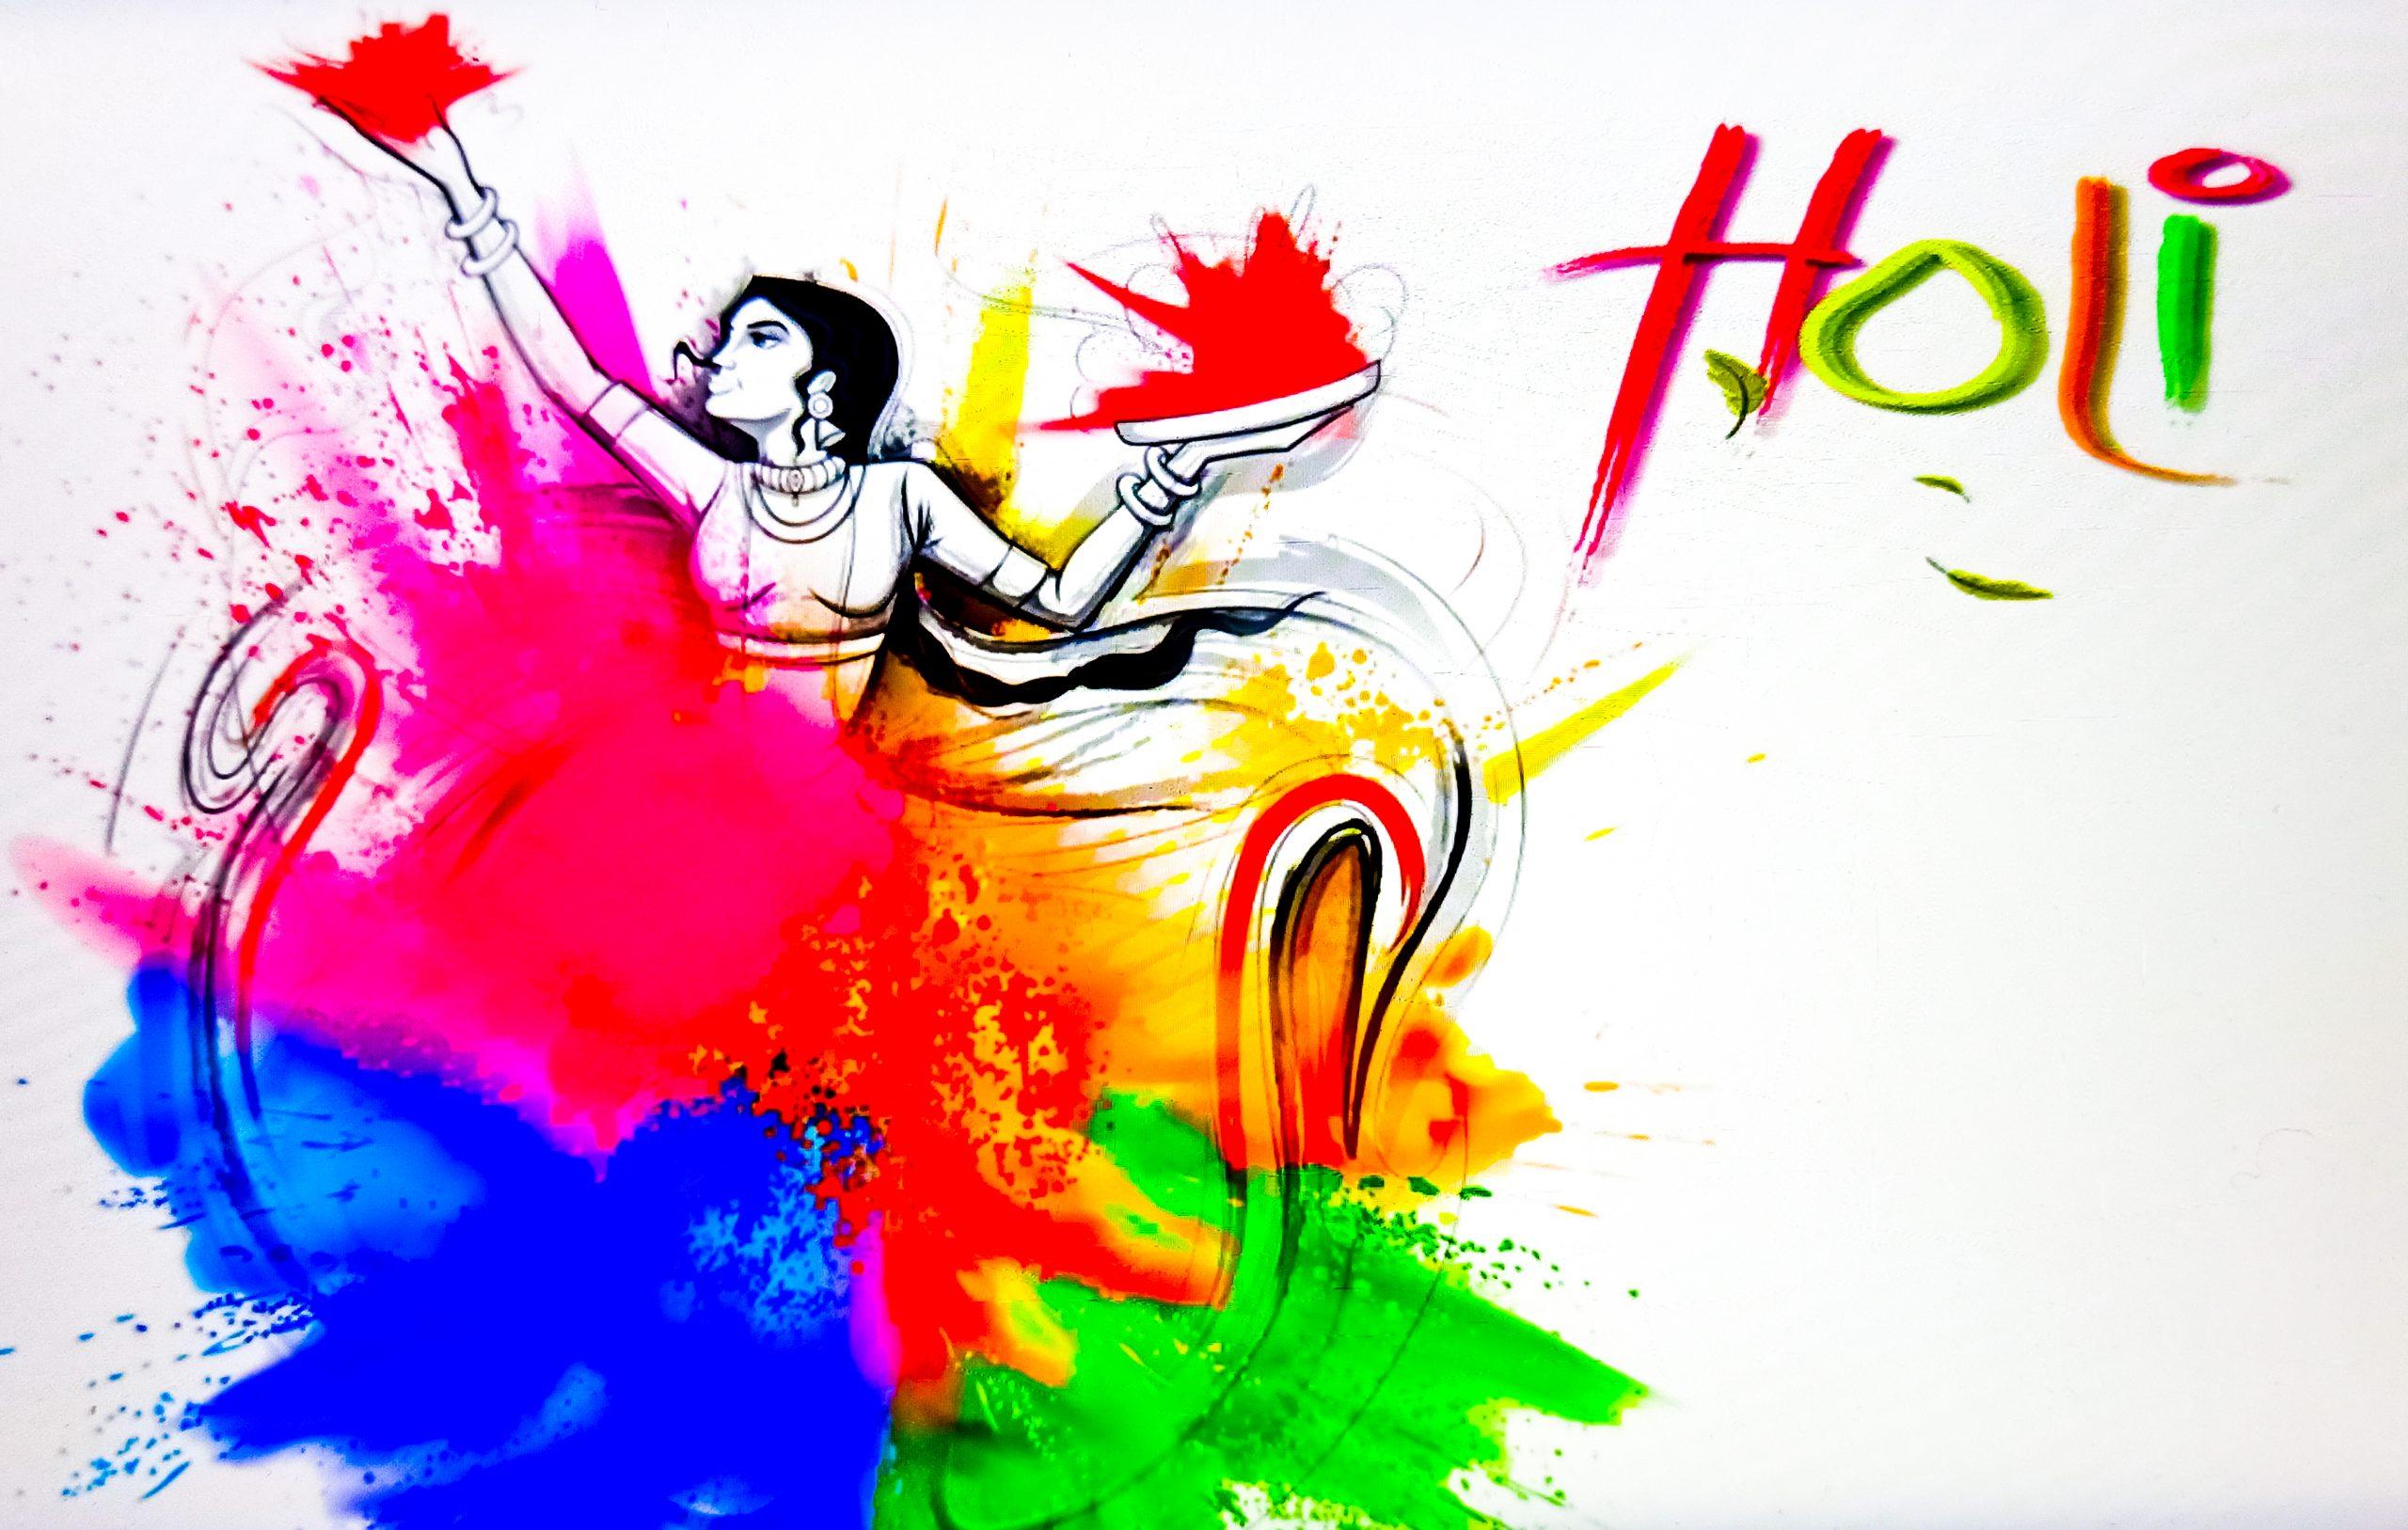 Poster of Holi celebration